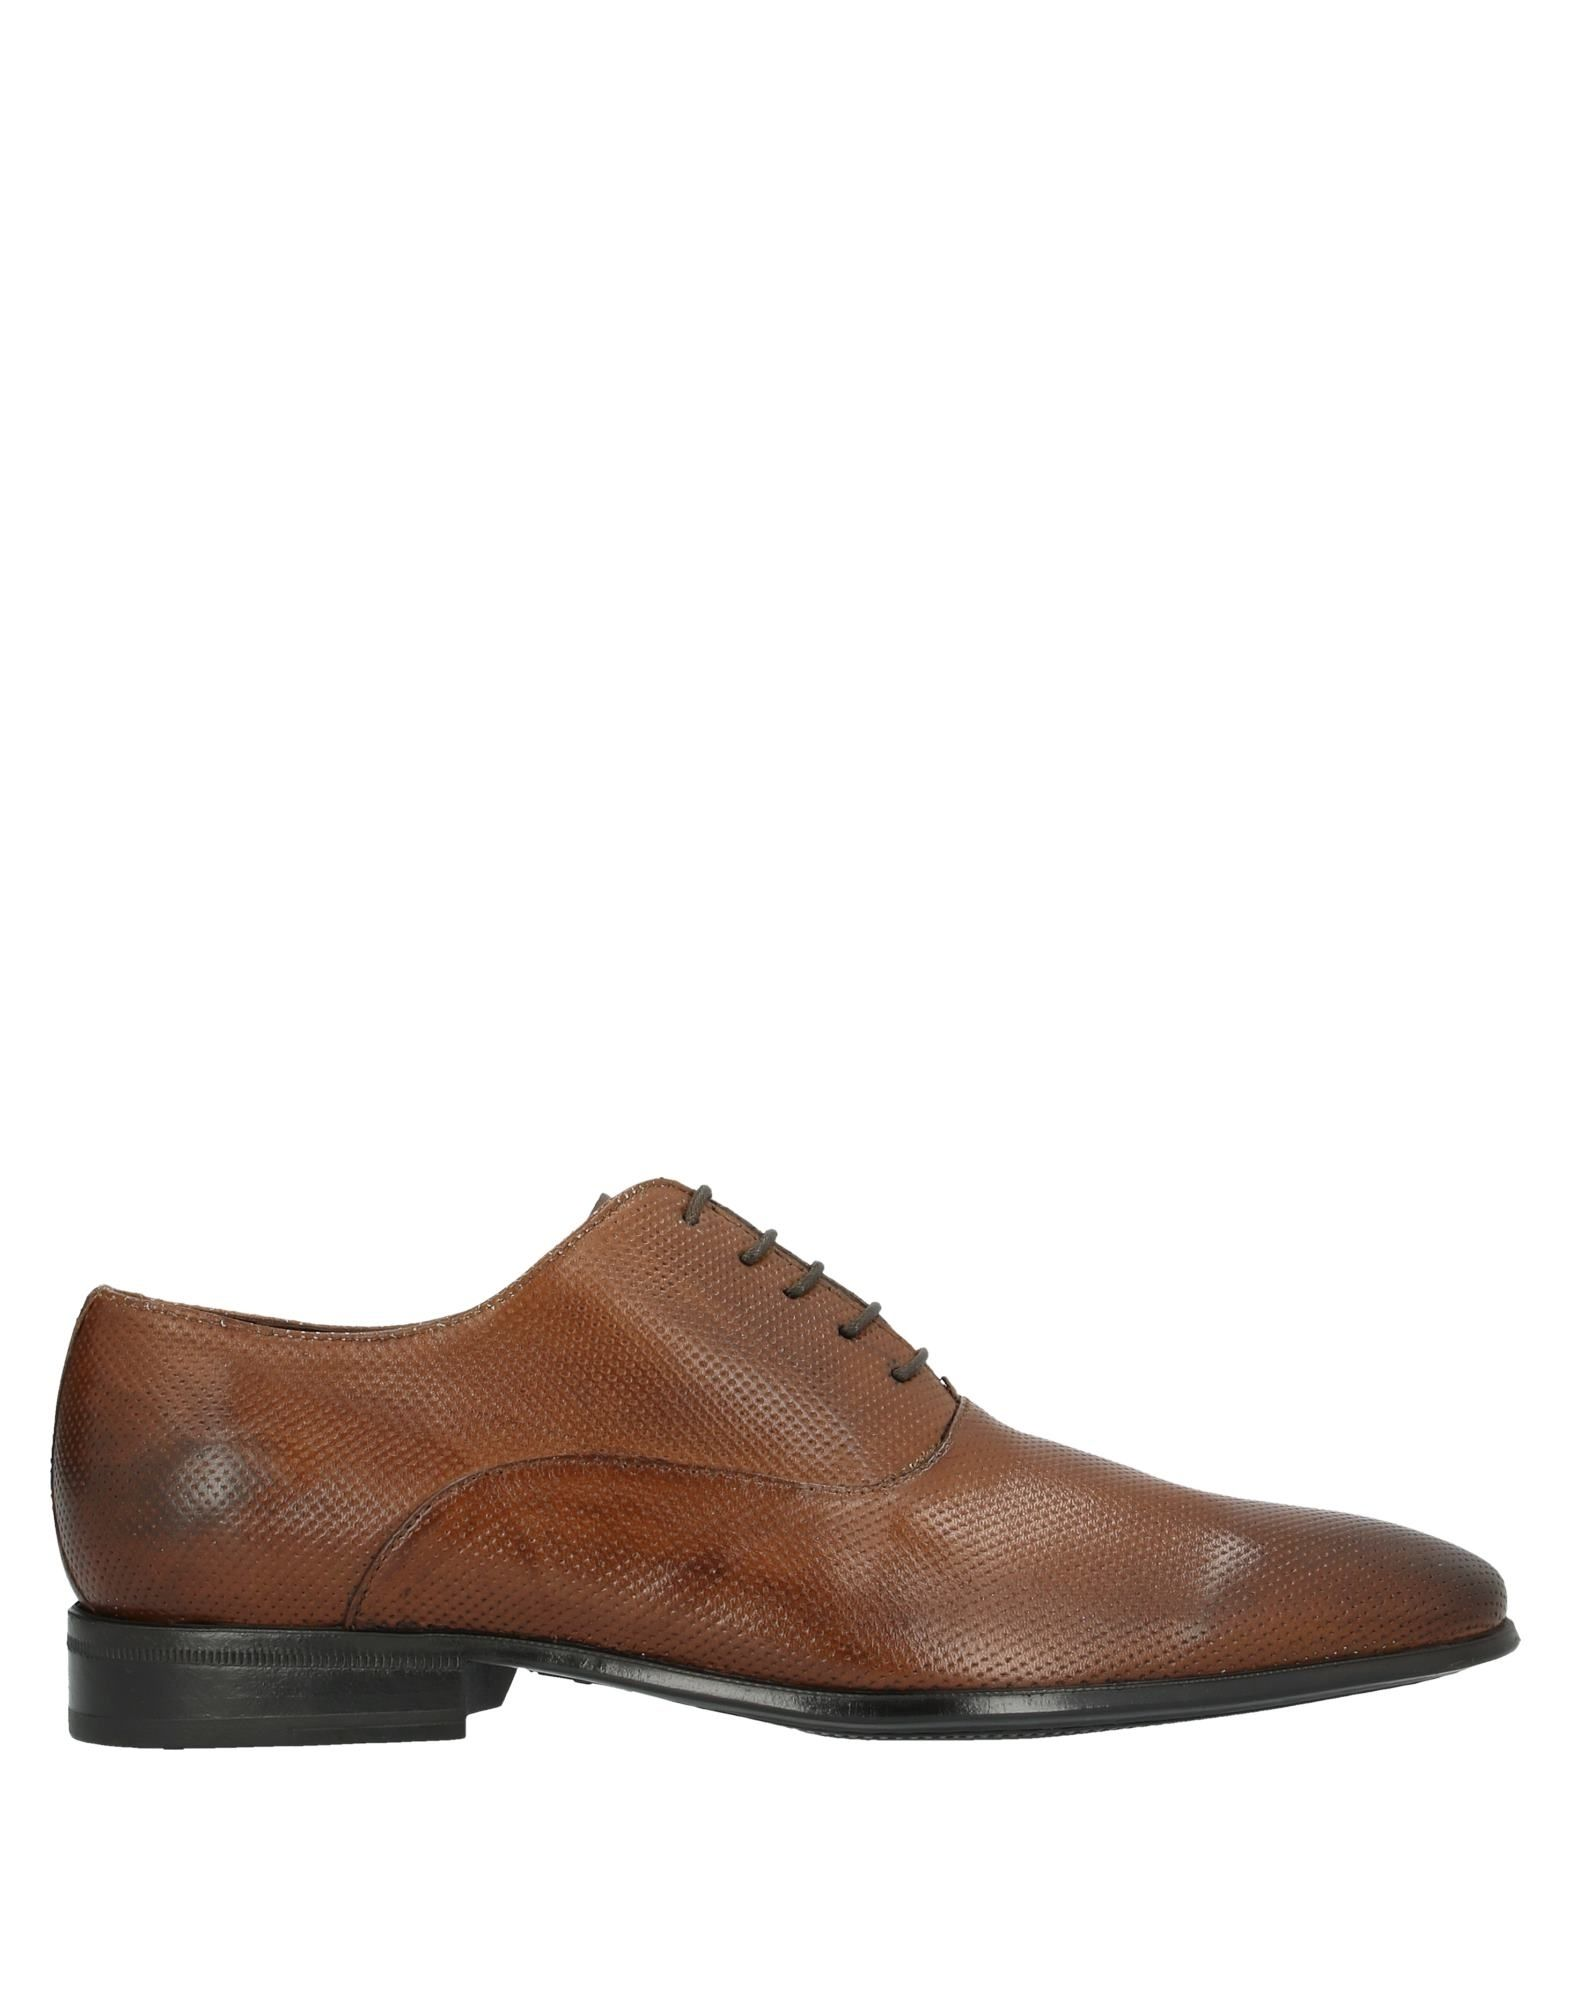 CALPIERRE Обувь на шнурках wow обувь на шнурках